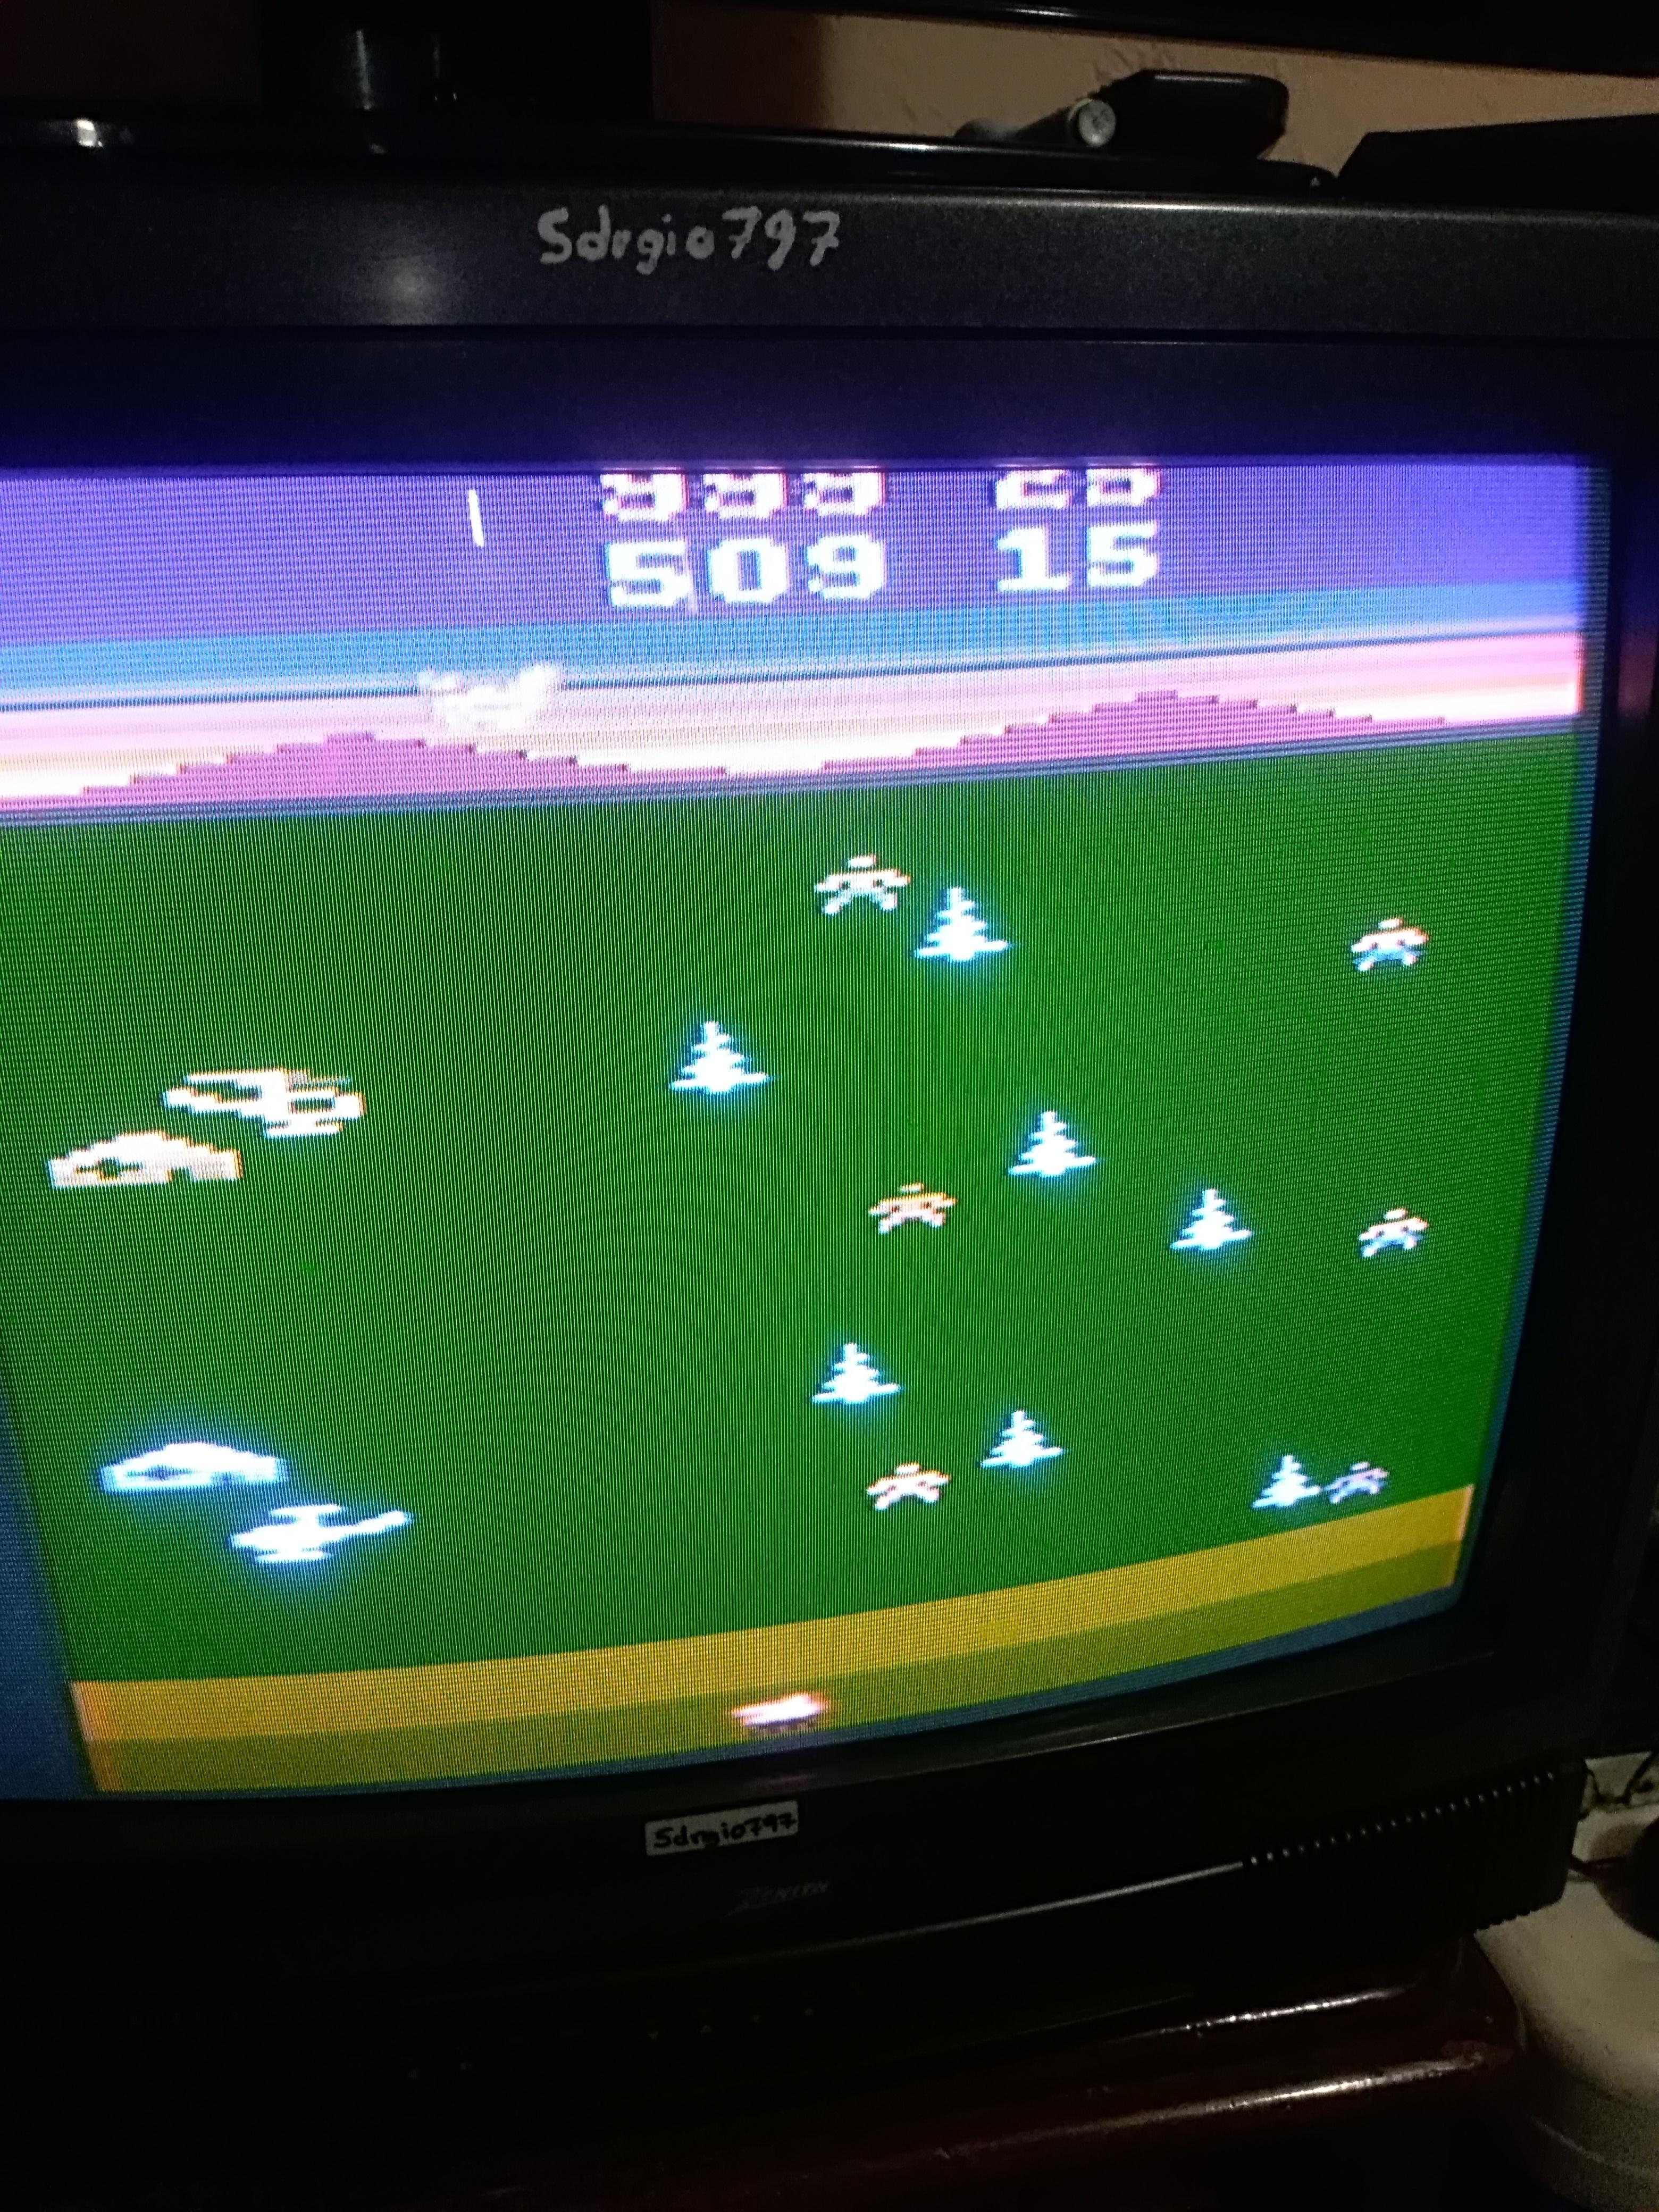 Sdrgio797: MASH (Atari 2600 Expert/A) 509 points on 2020-06-30 20:07:46